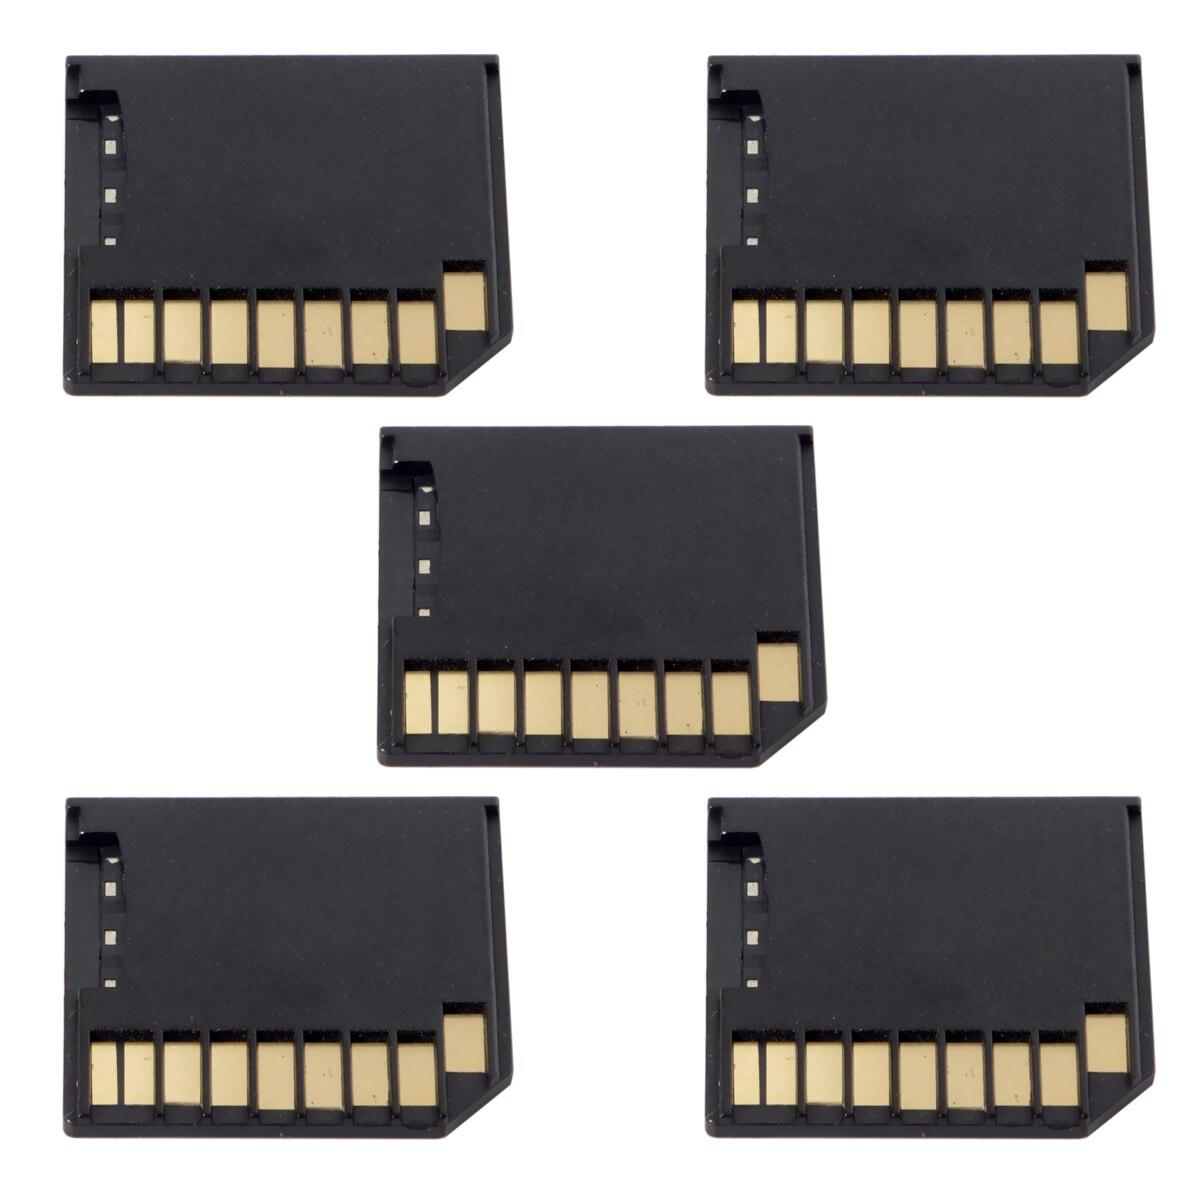 5 piezas Micro SD TF a Kit de tarjeta SD Mini adaptador de perfil bajo para almacenamiento Extra Macbook Air/Pro /Retina negro